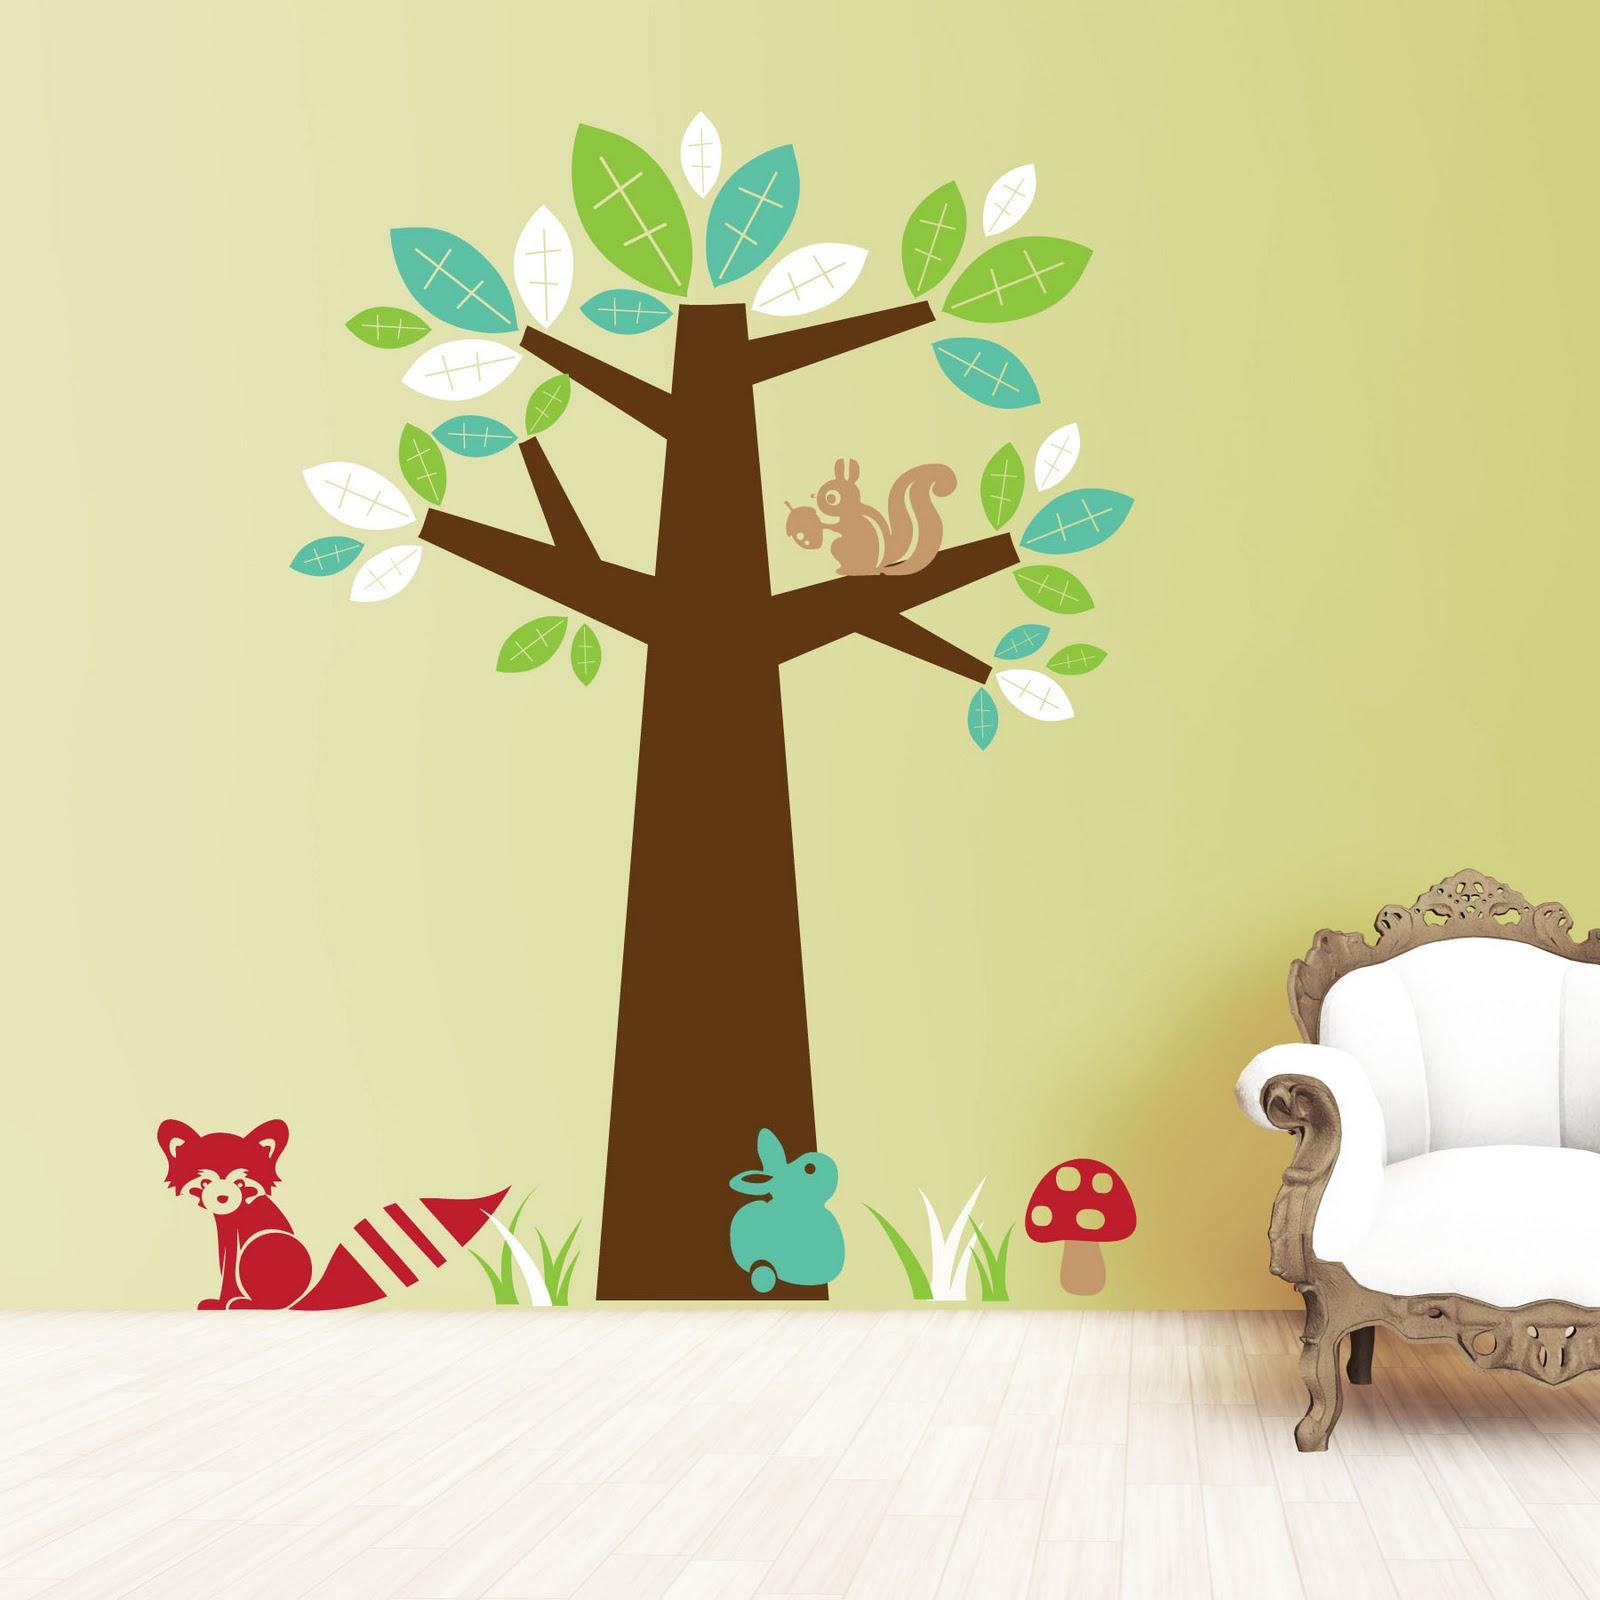 http://4.bp.blogspot.com/-hGT8rIdteVc/TrlXgc45vRI/AAAAAAAADVk/I1cc0is2jVo/s1600/CT151+-+Modern+Woodland+Tree.jpg